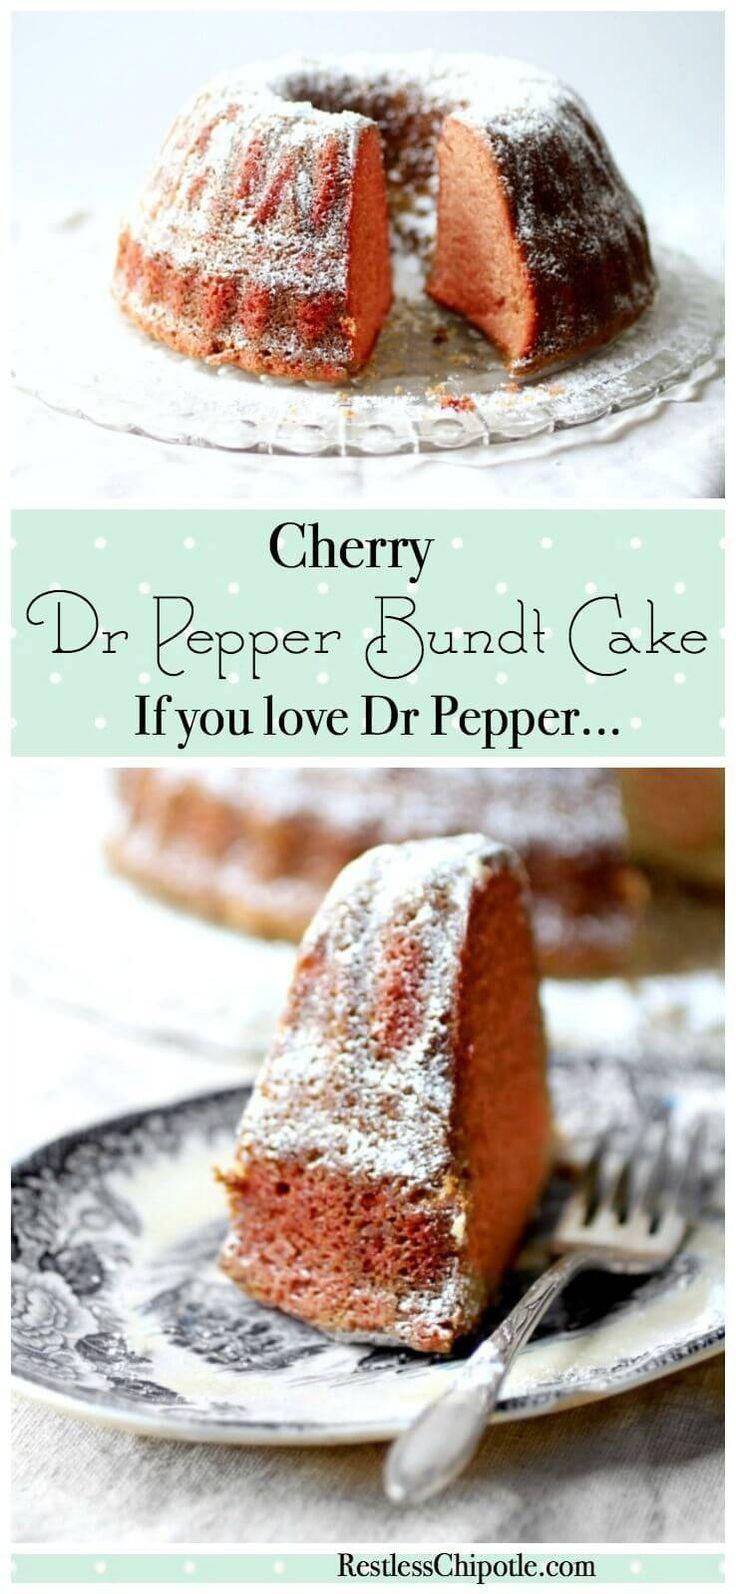 A Cherry Bundt Cake With Attitude Dr Pepper